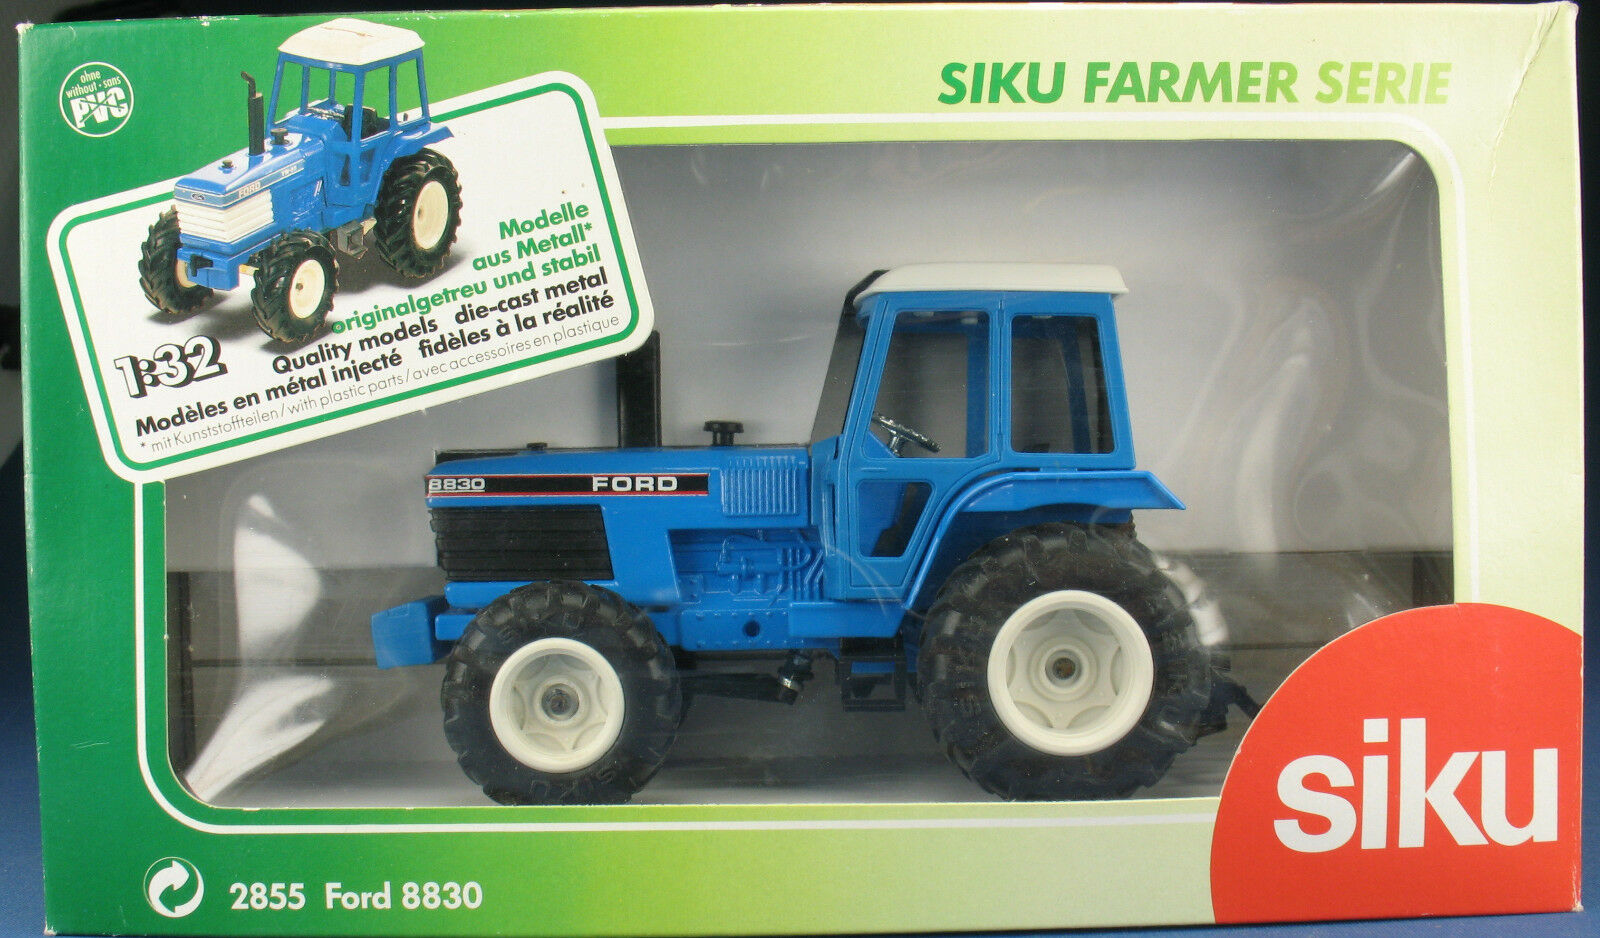 SIKU FARMER 2855 - FORD TW 35 - Traktor - NEU in OVP - 1 32 - Tractor    Angemessener Preis